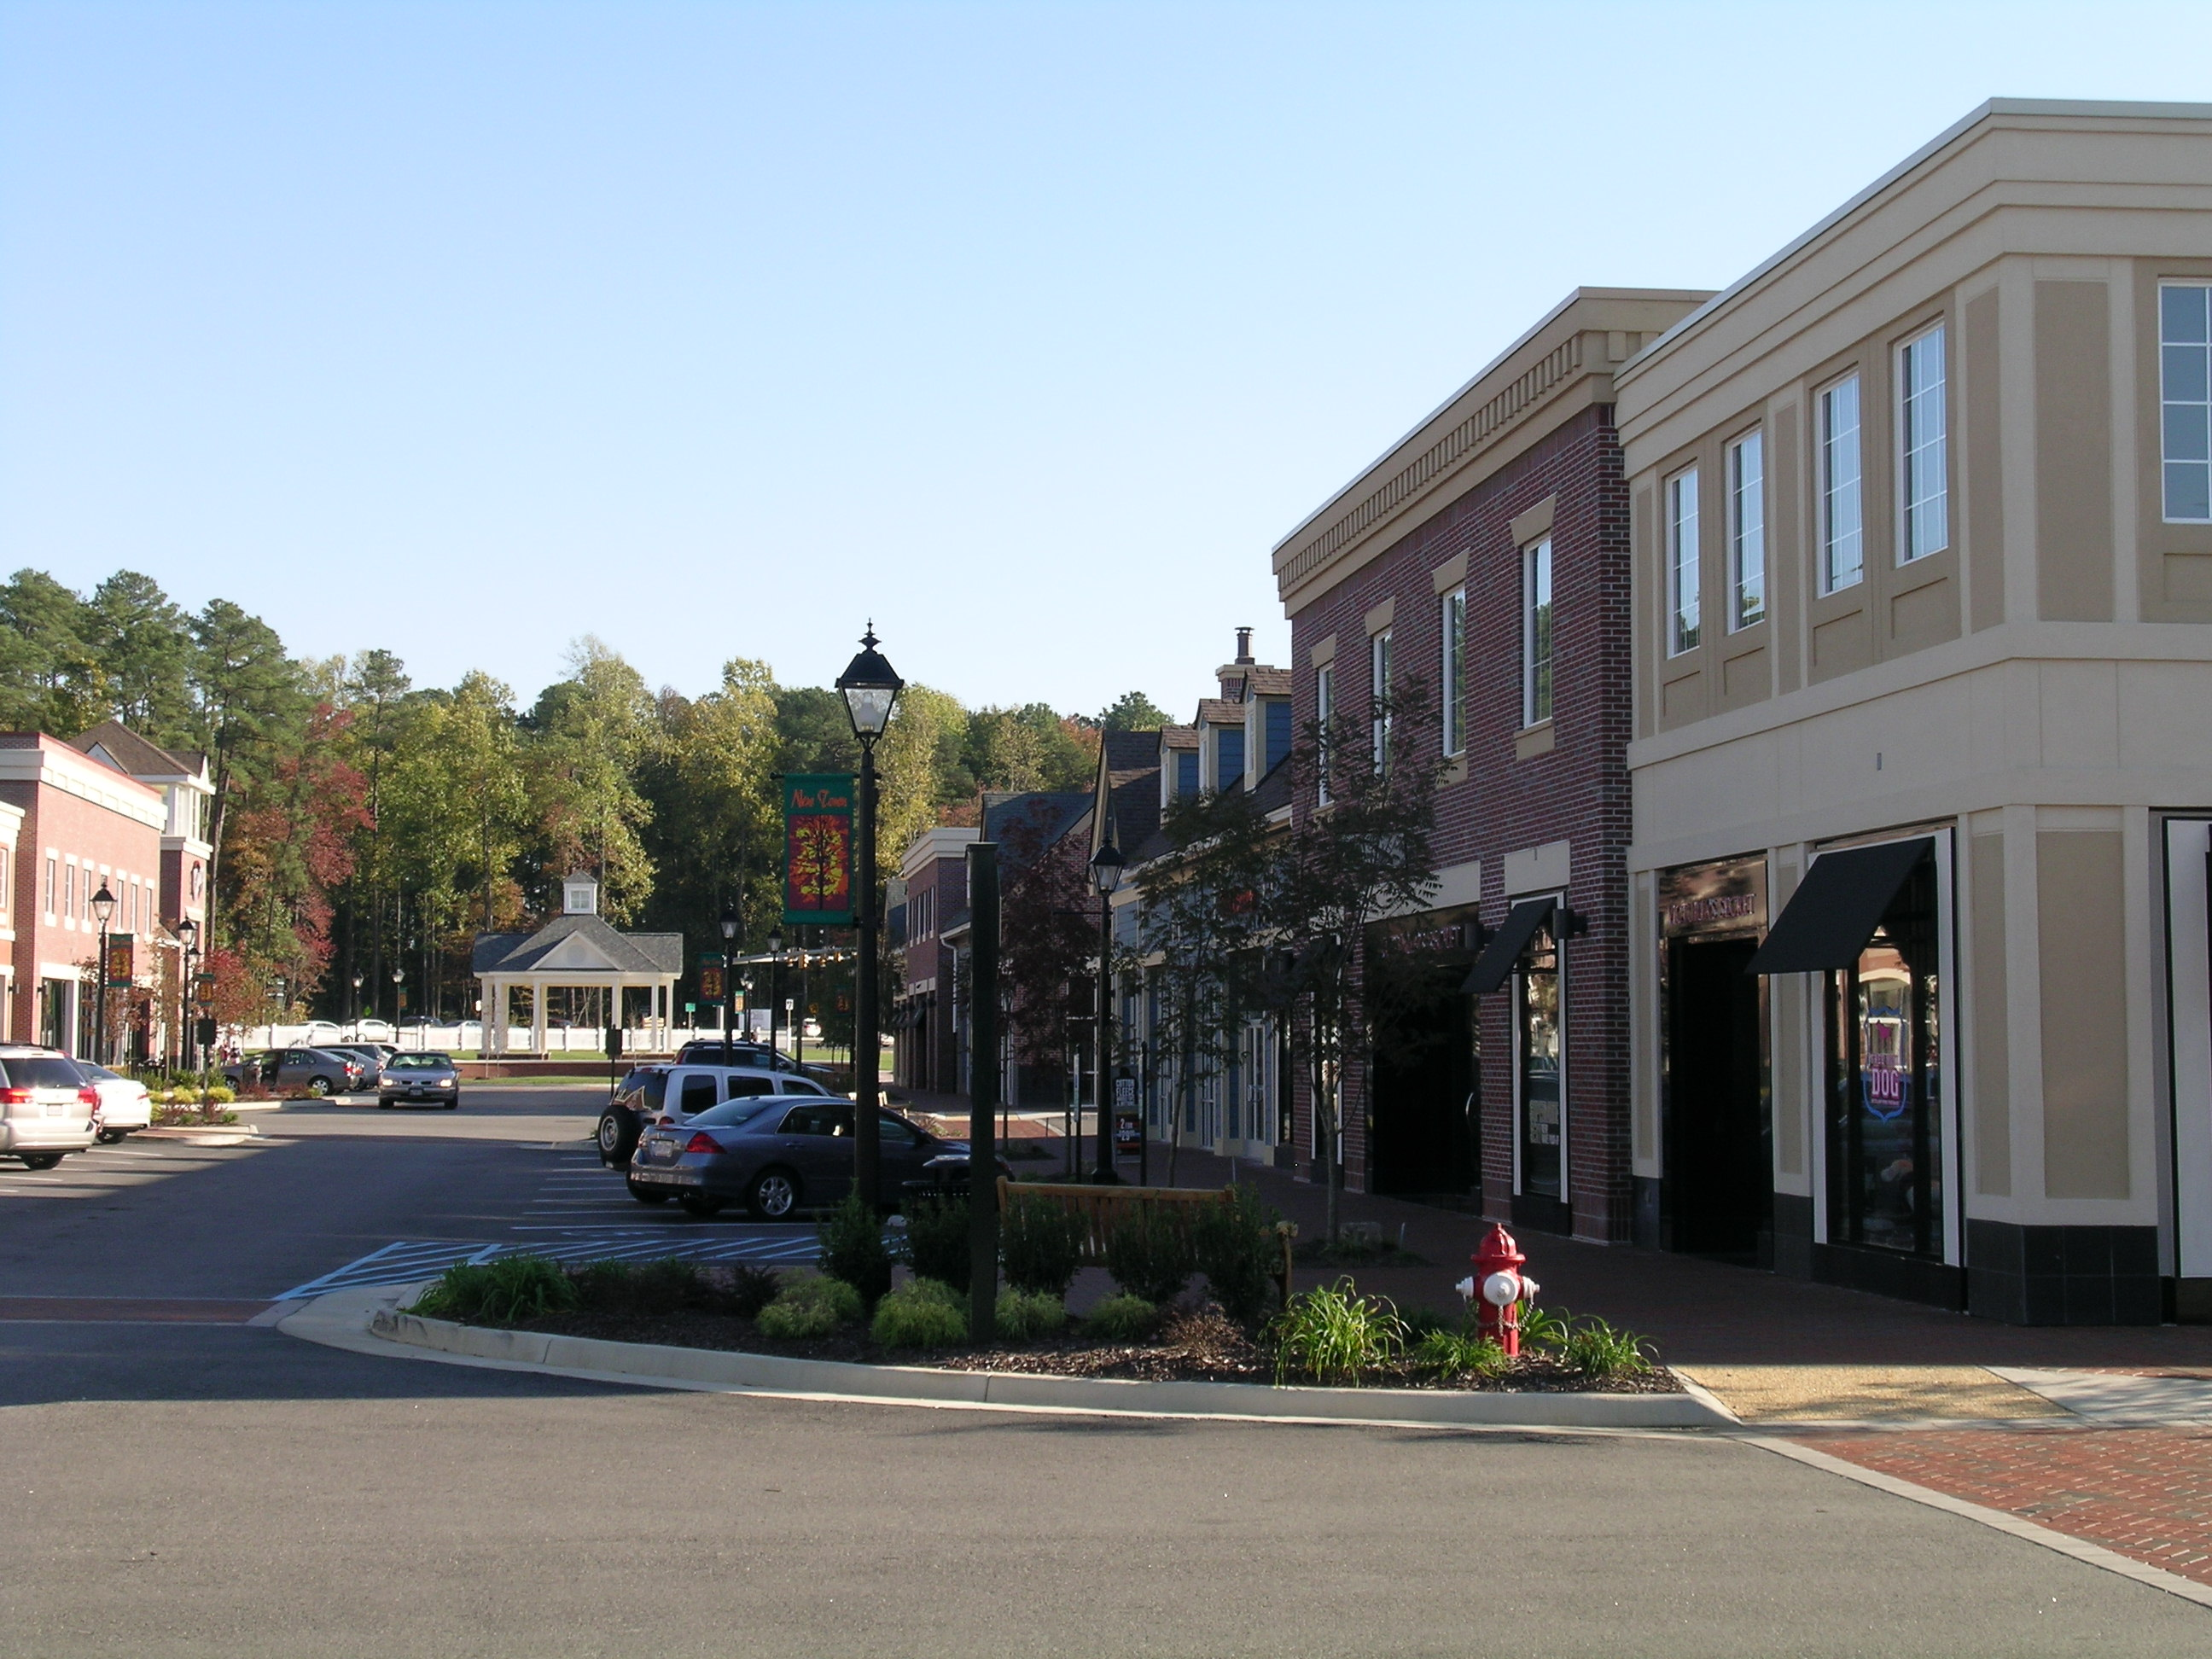 New town williamsburg va mr williamsburg blogging on for To do in williamsburg